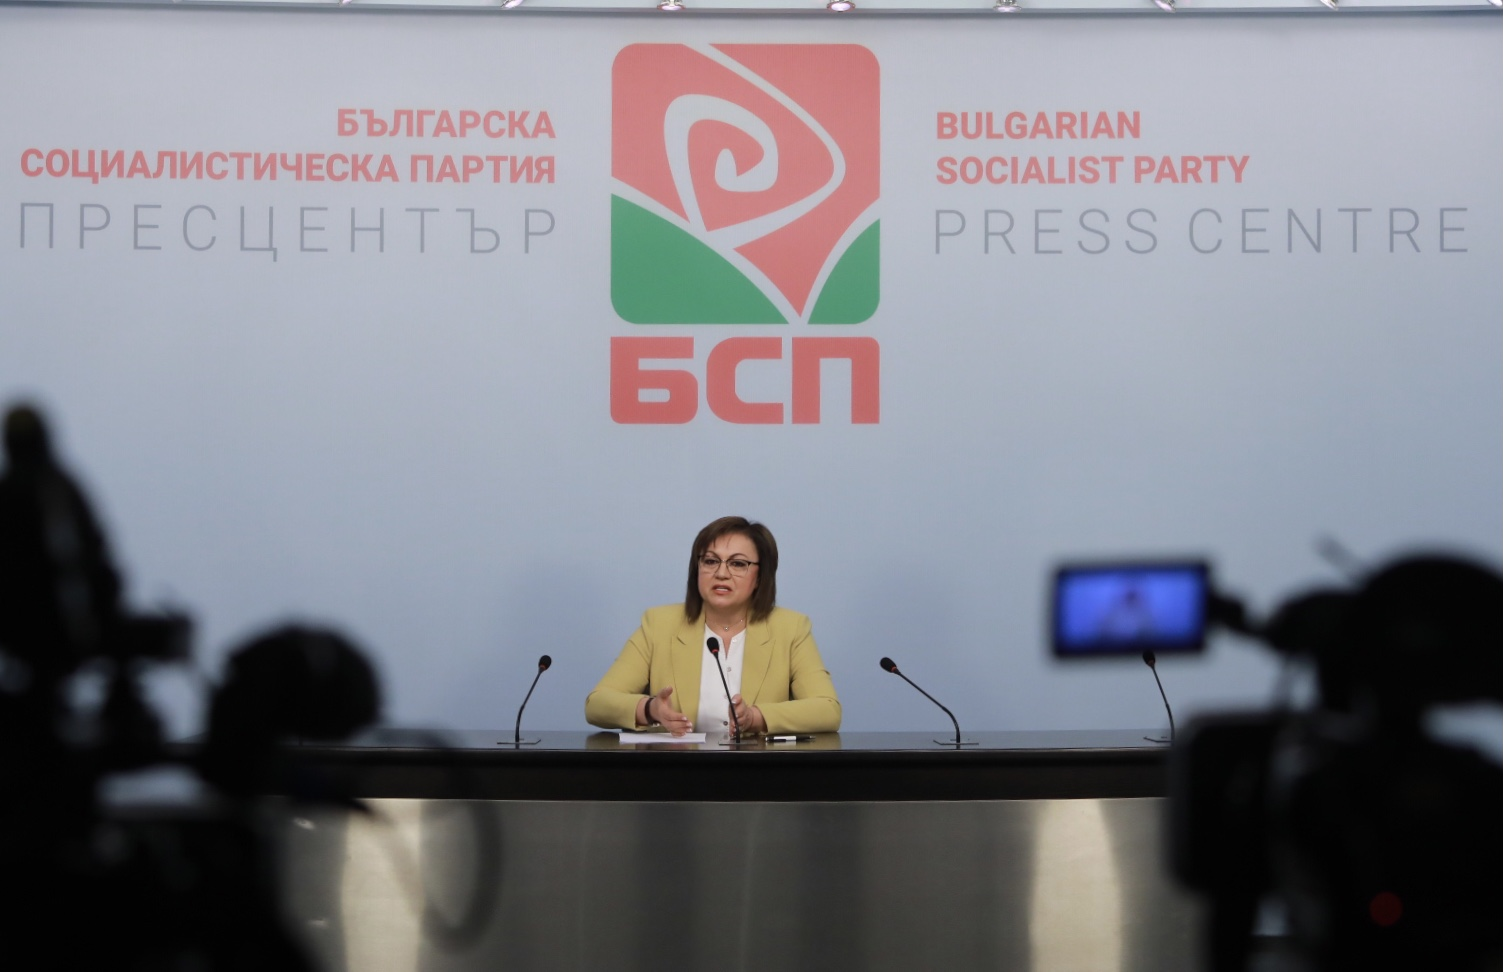 Пресконференция на БСП